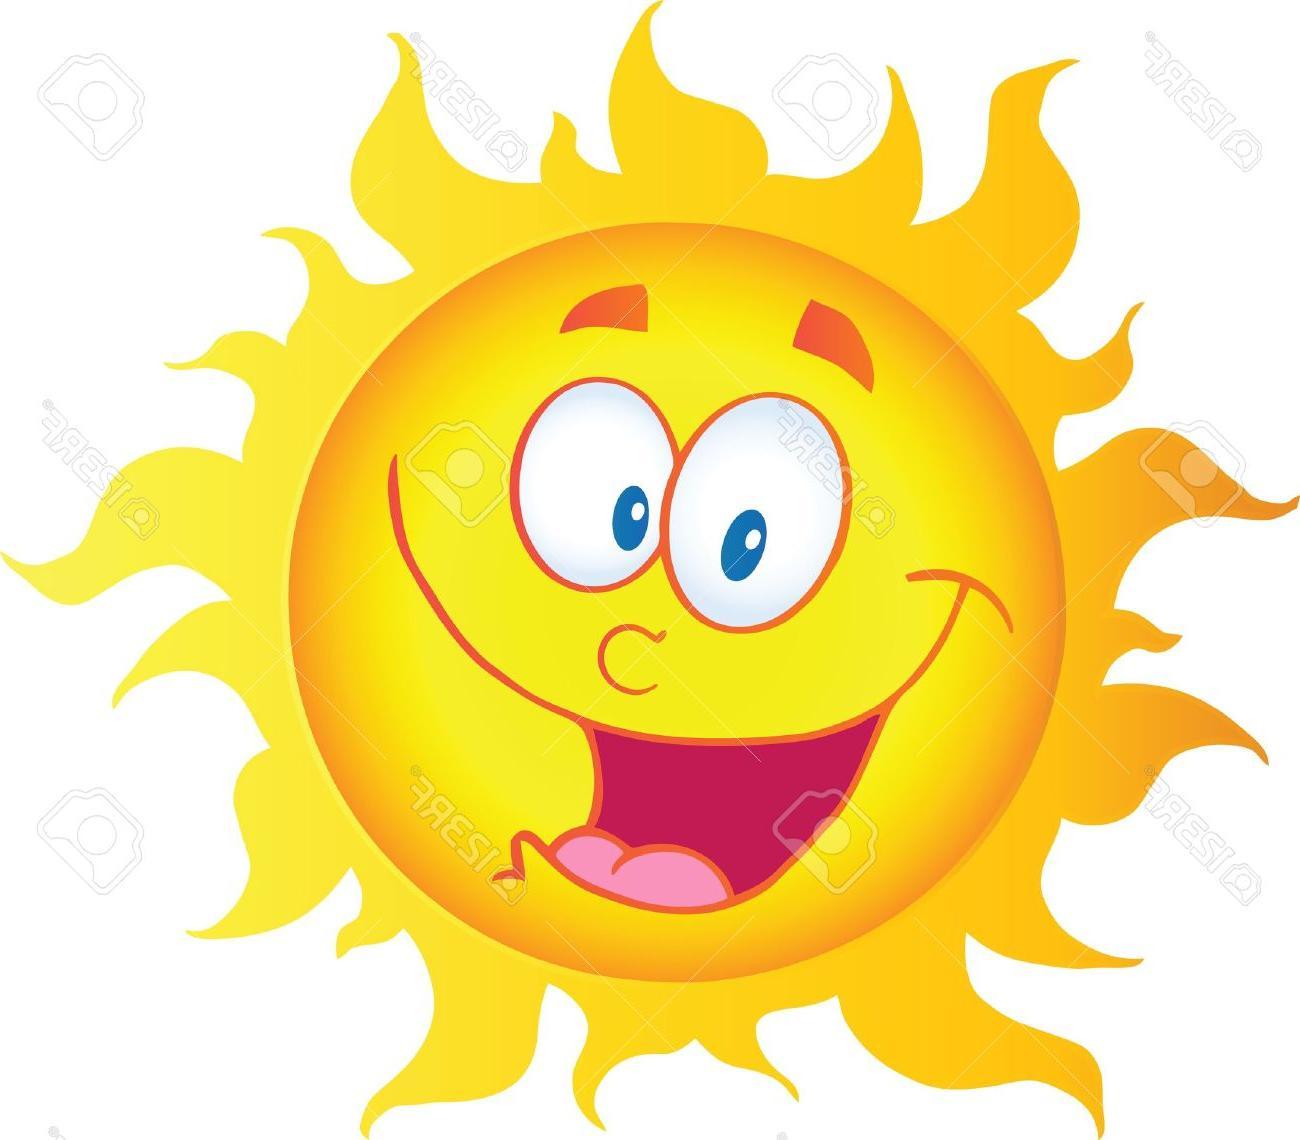 Best Free Sunshine Smiley Face Clip Art Vector Cdr » Free Vector Art.